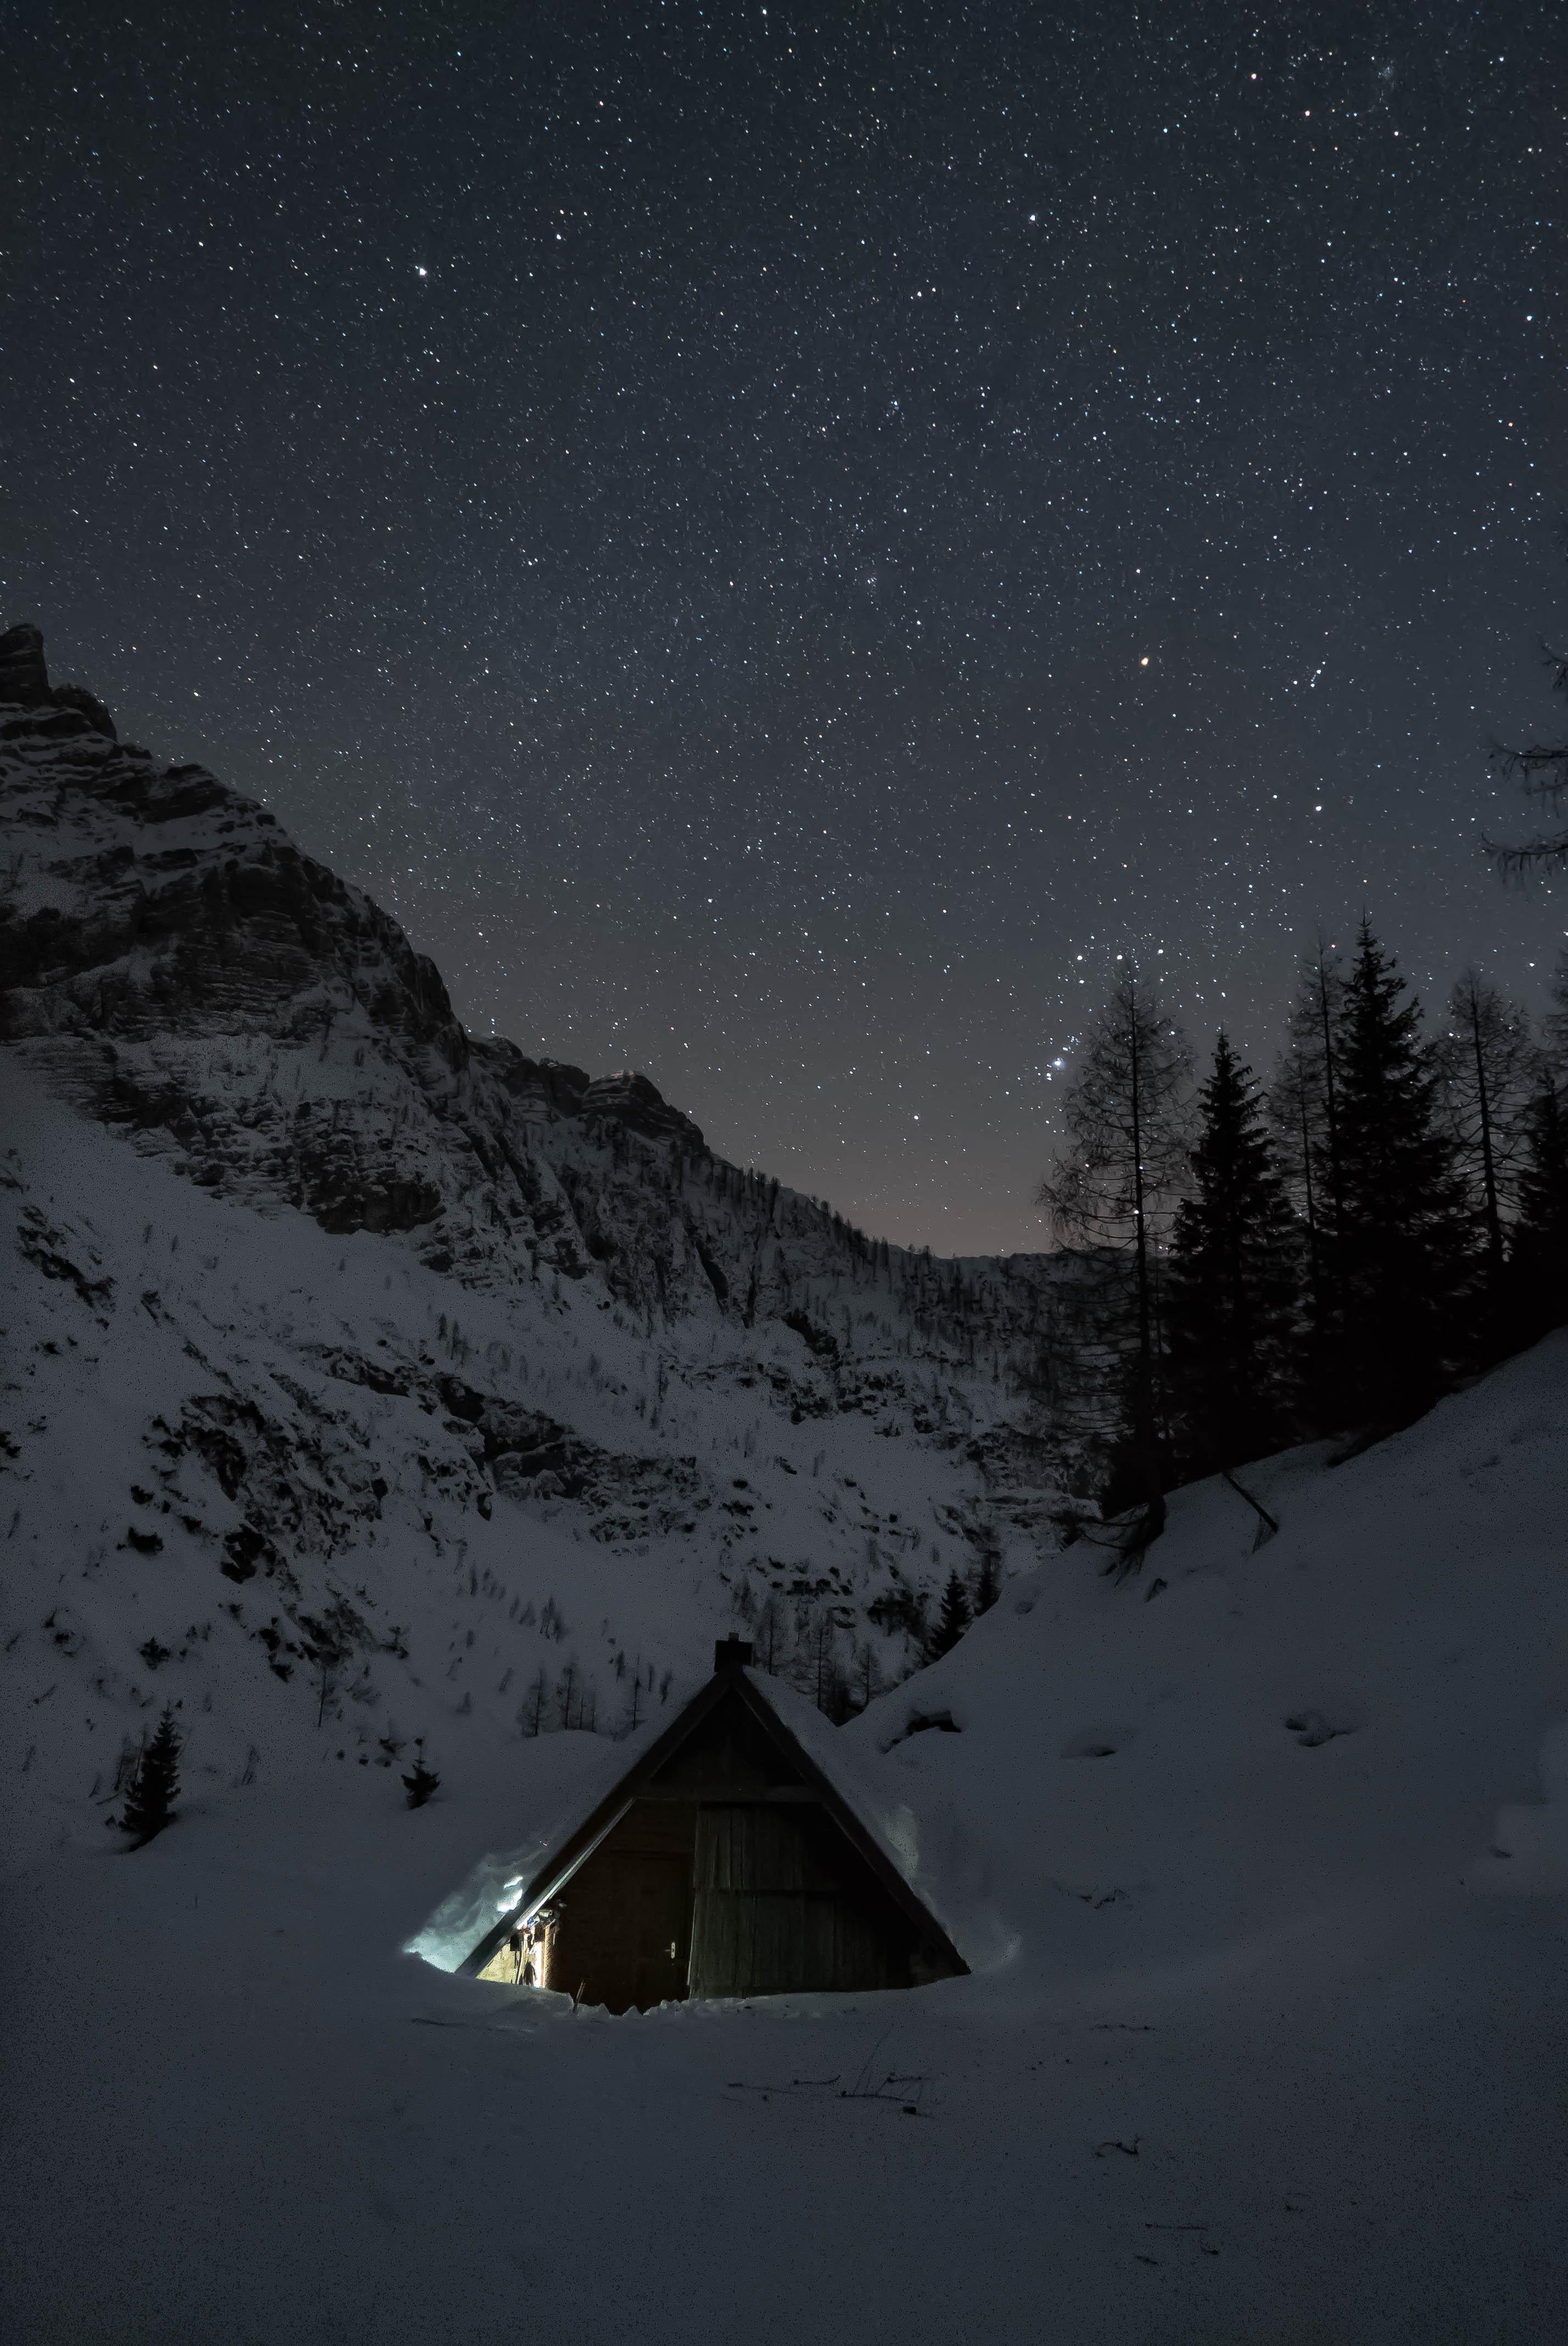 hegyek_es_csillagok_vegleges.jpg